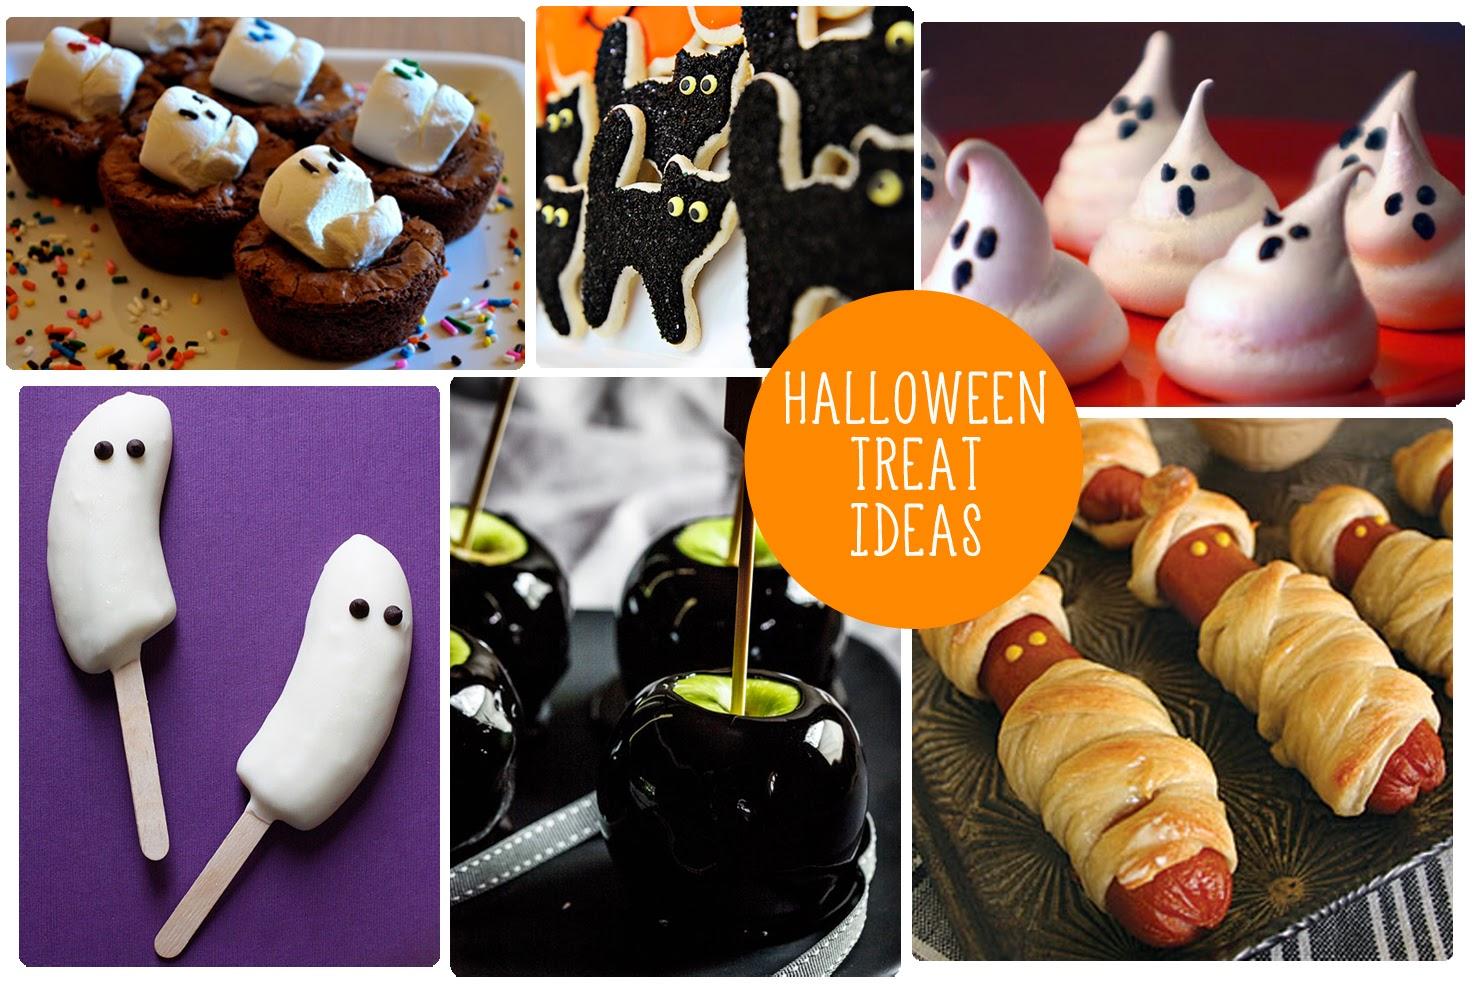 Flingers Party Shop Blog: Trick or Treat - Halloween Recipes